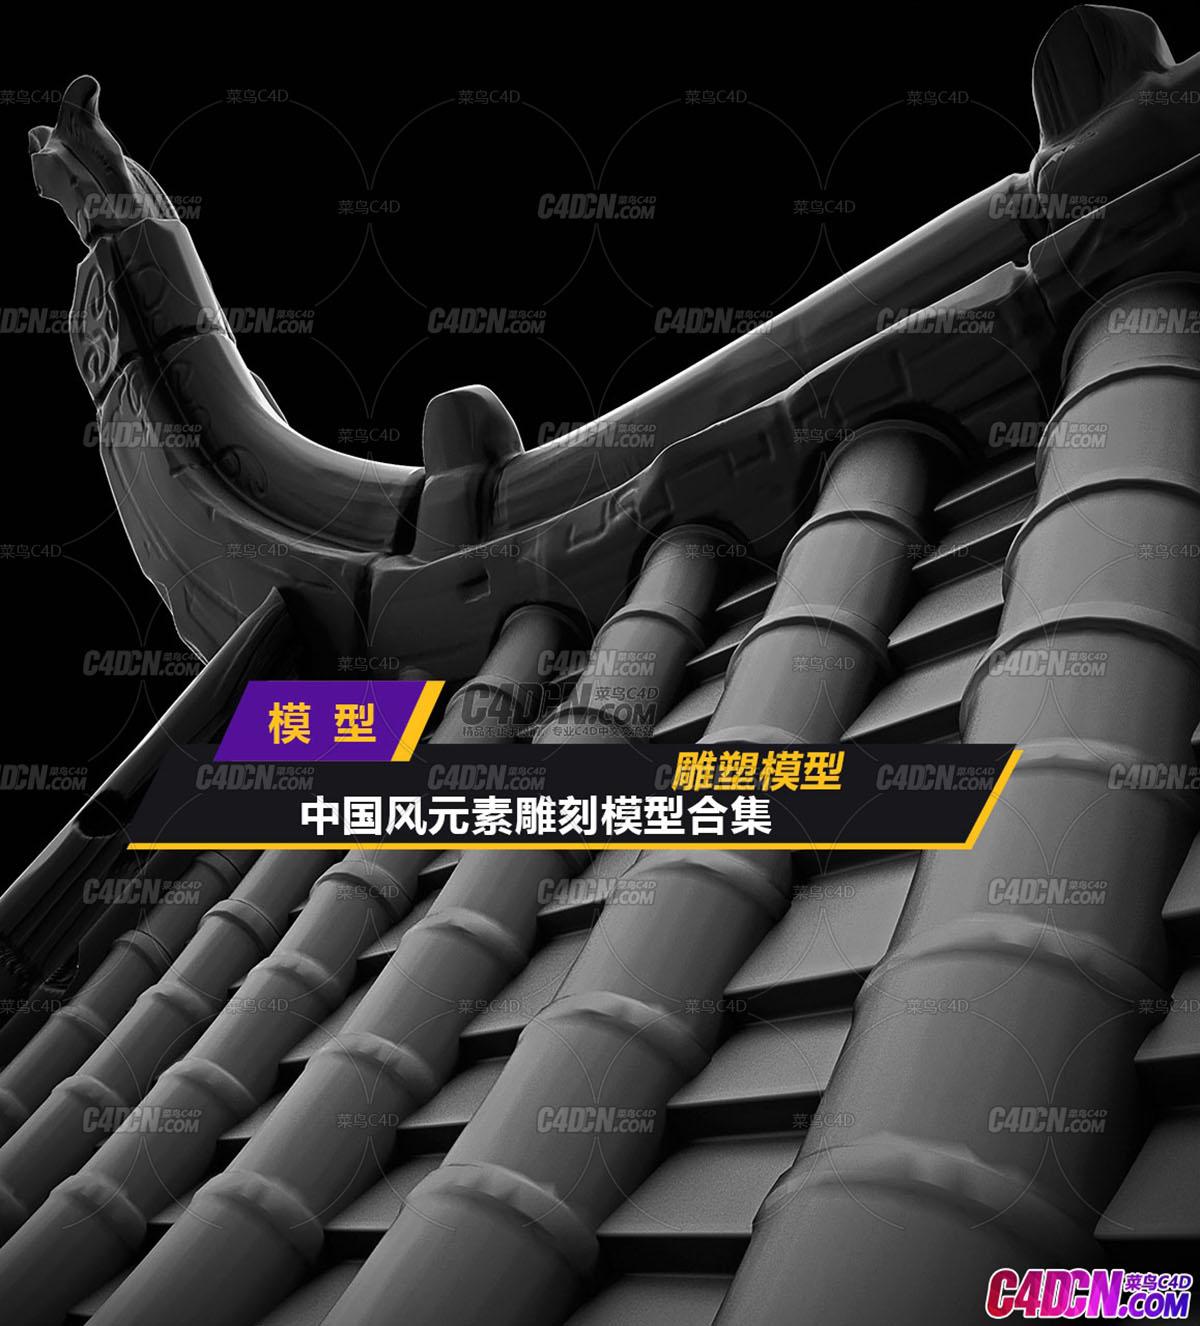 china_props_kit_roof.jpg